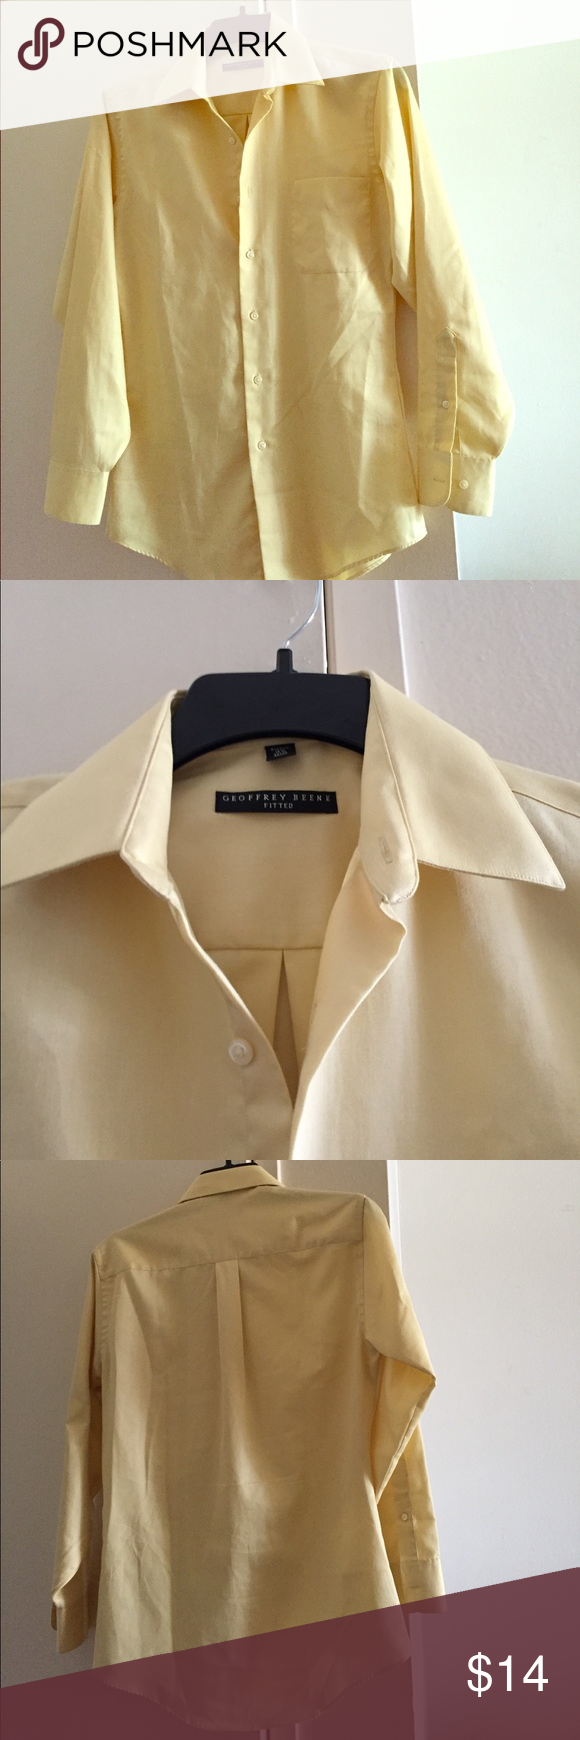 Yellow dress shirt men  Geoffrey Beene menus shirt  Geoffrey beene shirts Dress shirts and